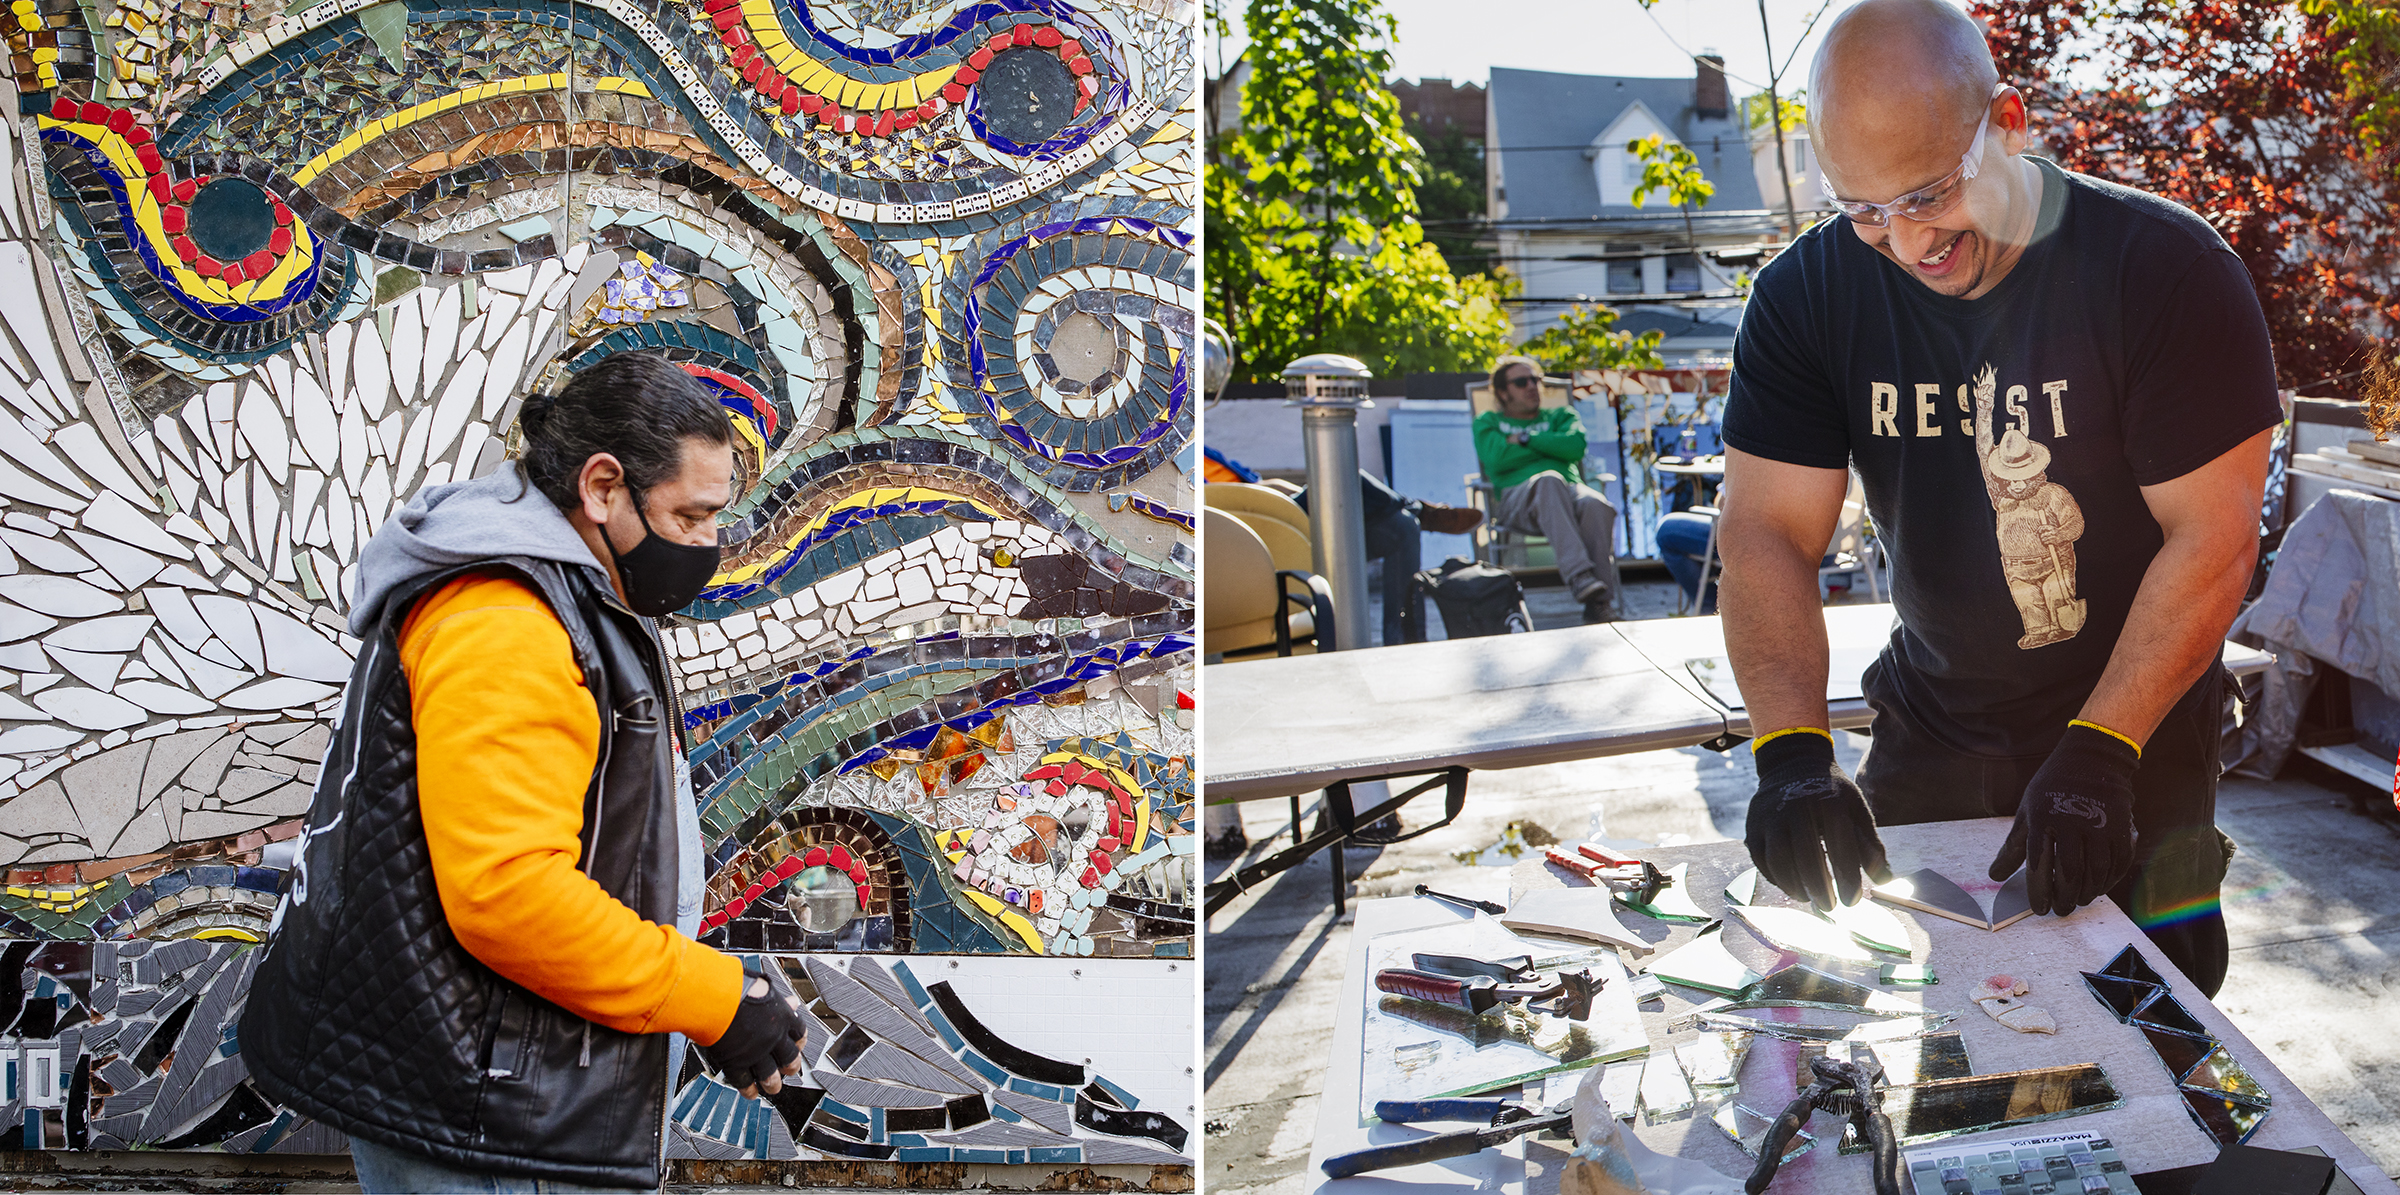 Artists Carlos Pinto on location and John Sear in the Brooklyn studio. Mike Fernandez/Audubon